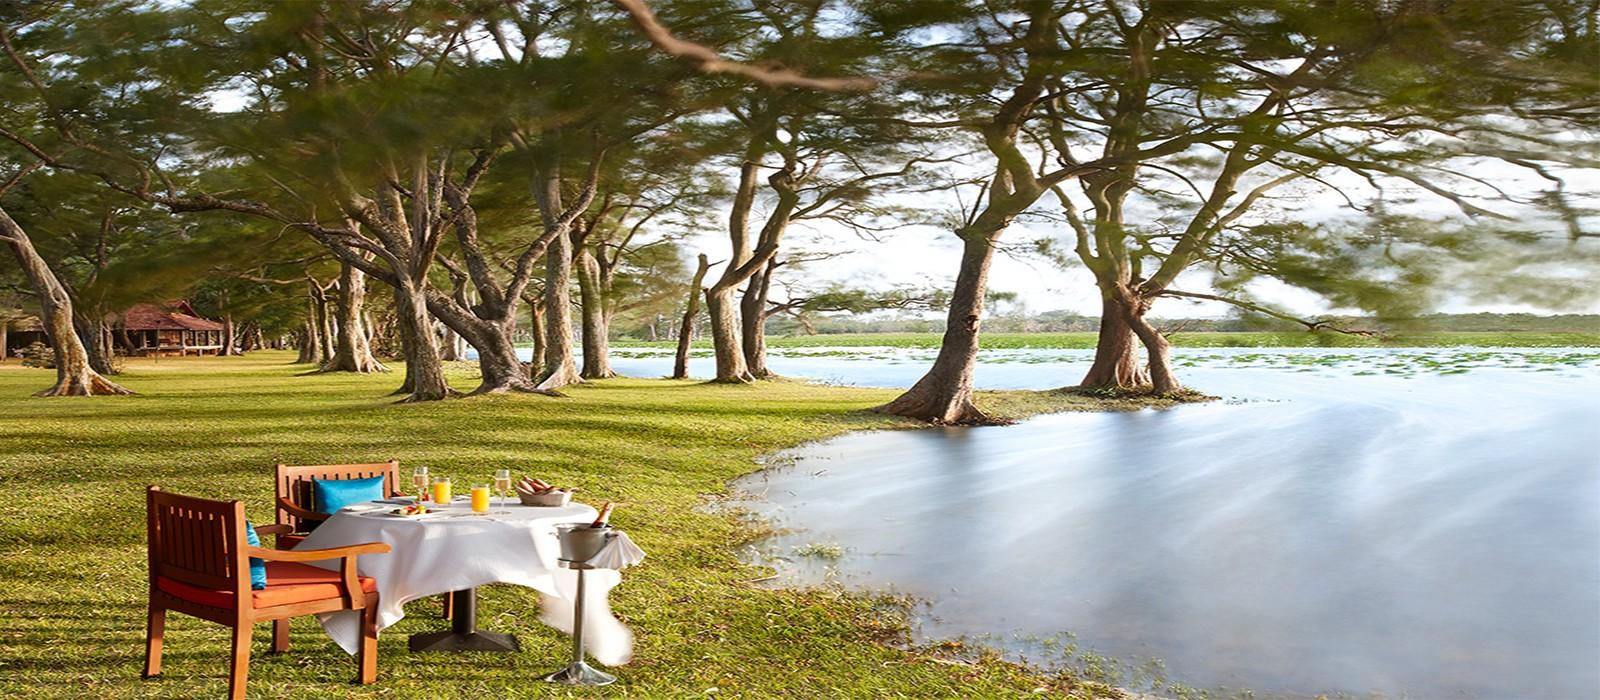 Habarana Village by Cinnamon - Luxury Sri Lanka holiday packages - header